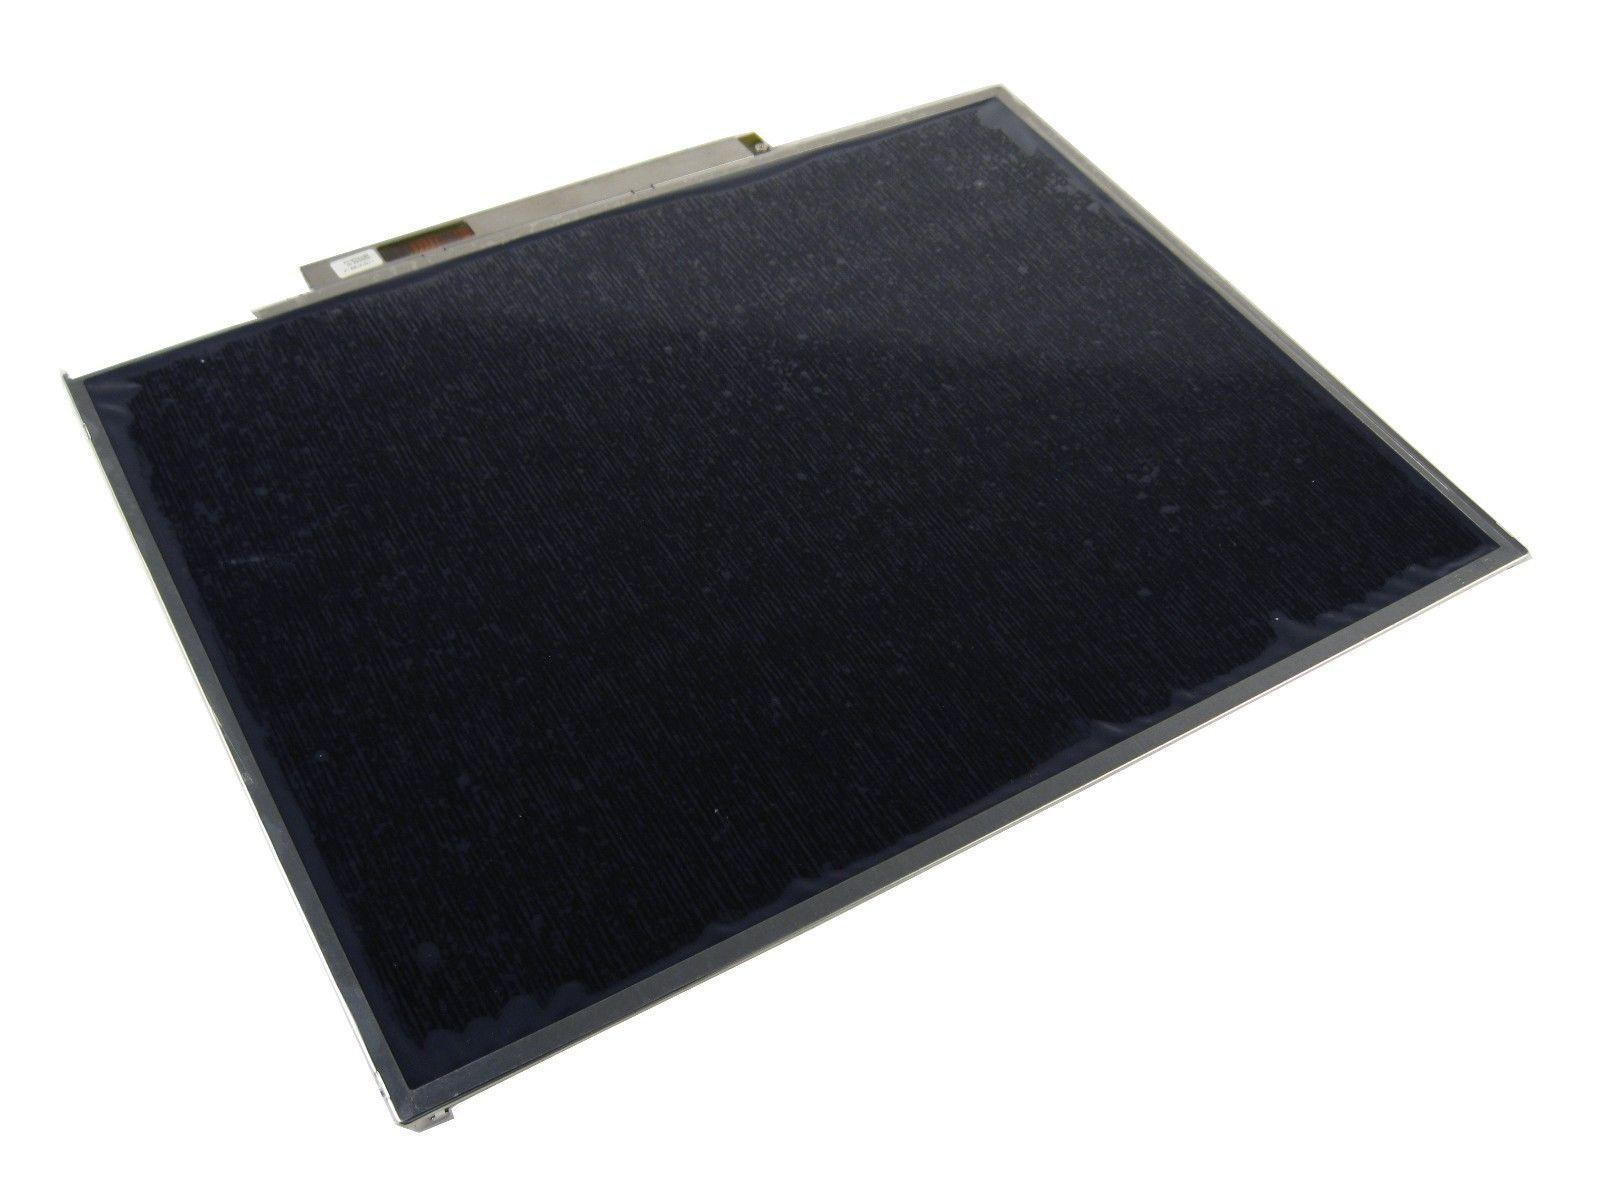 Dell H4400 Inspiron 2200 Matte 14.1 XGA LCD Display Hinges Cable LTN141XB-L04